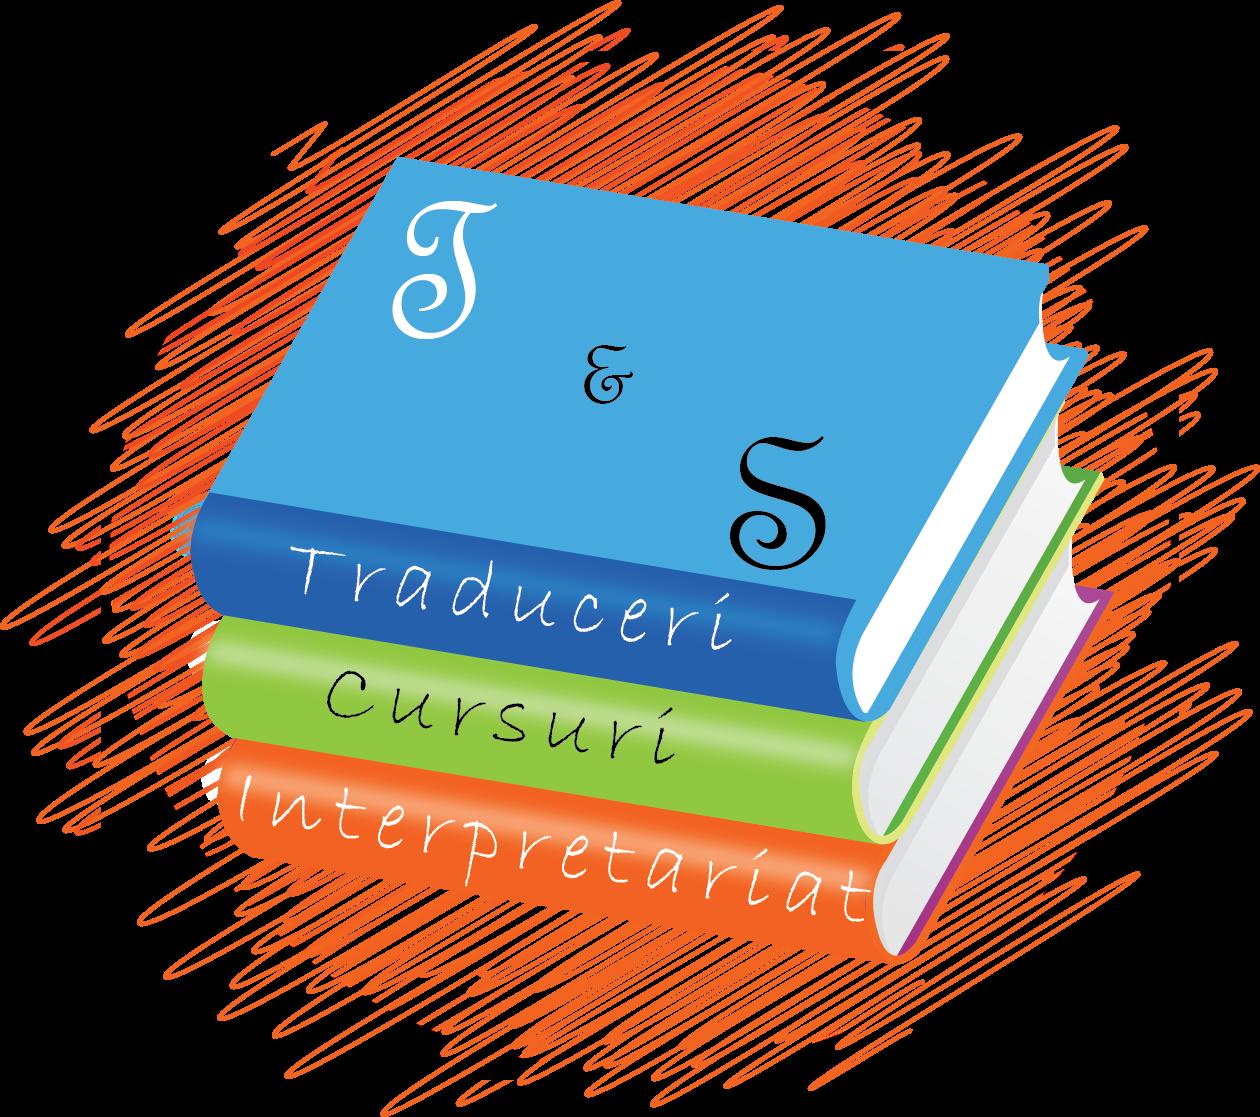 S.c. Sistemic Trad S.r.l.